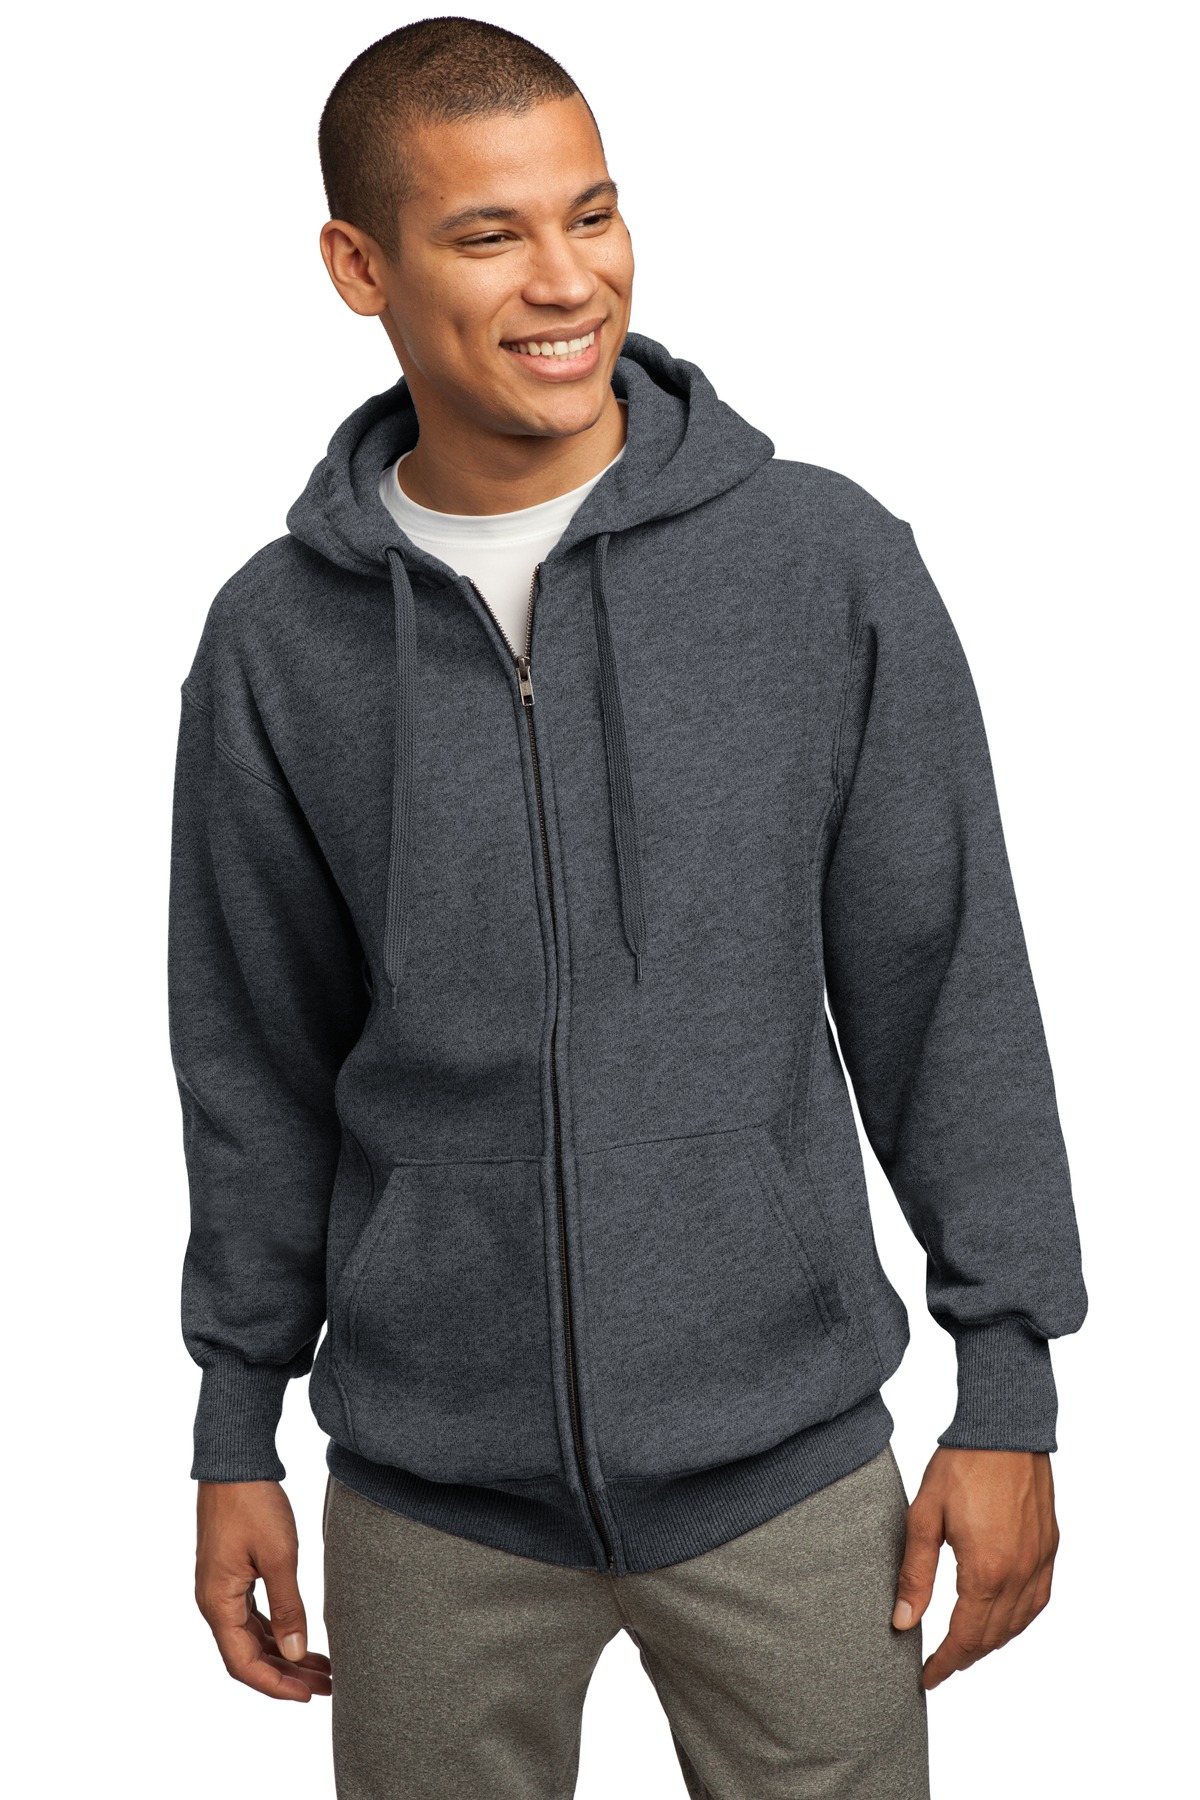 Sport-Tek - Super Heavyweight Full-Zip Hooded Sweatshirt. F282